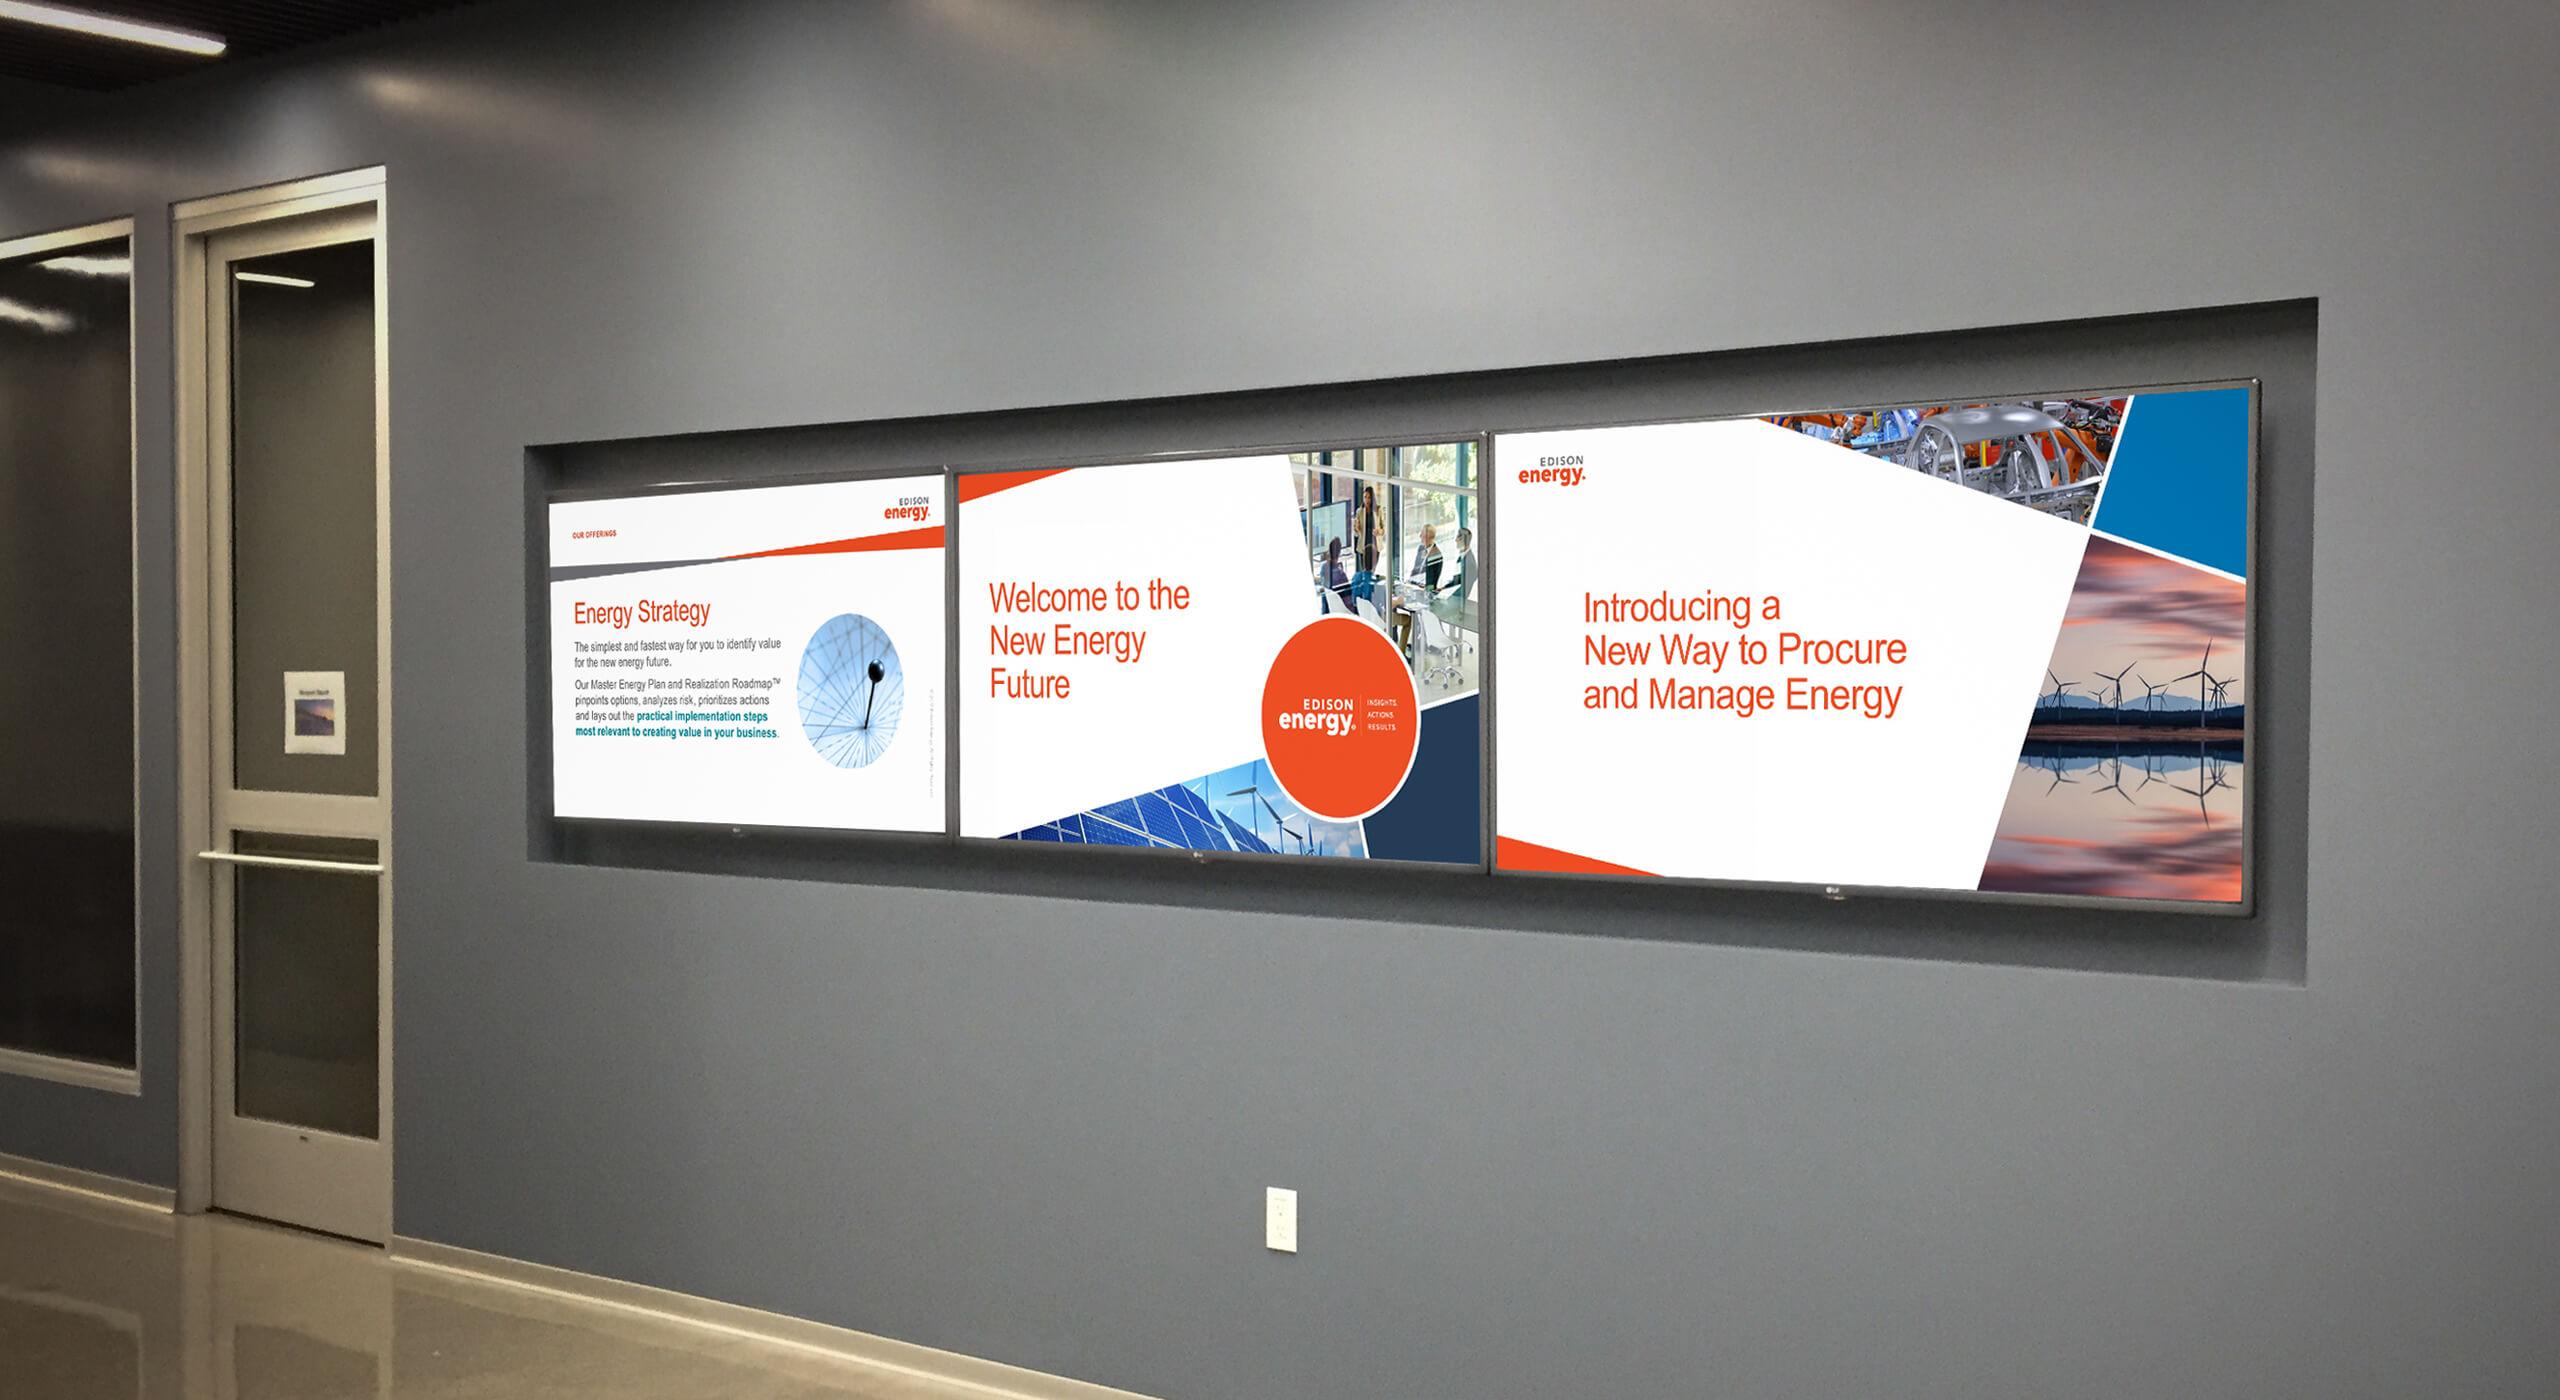 edison energy reskin lobby monitors image